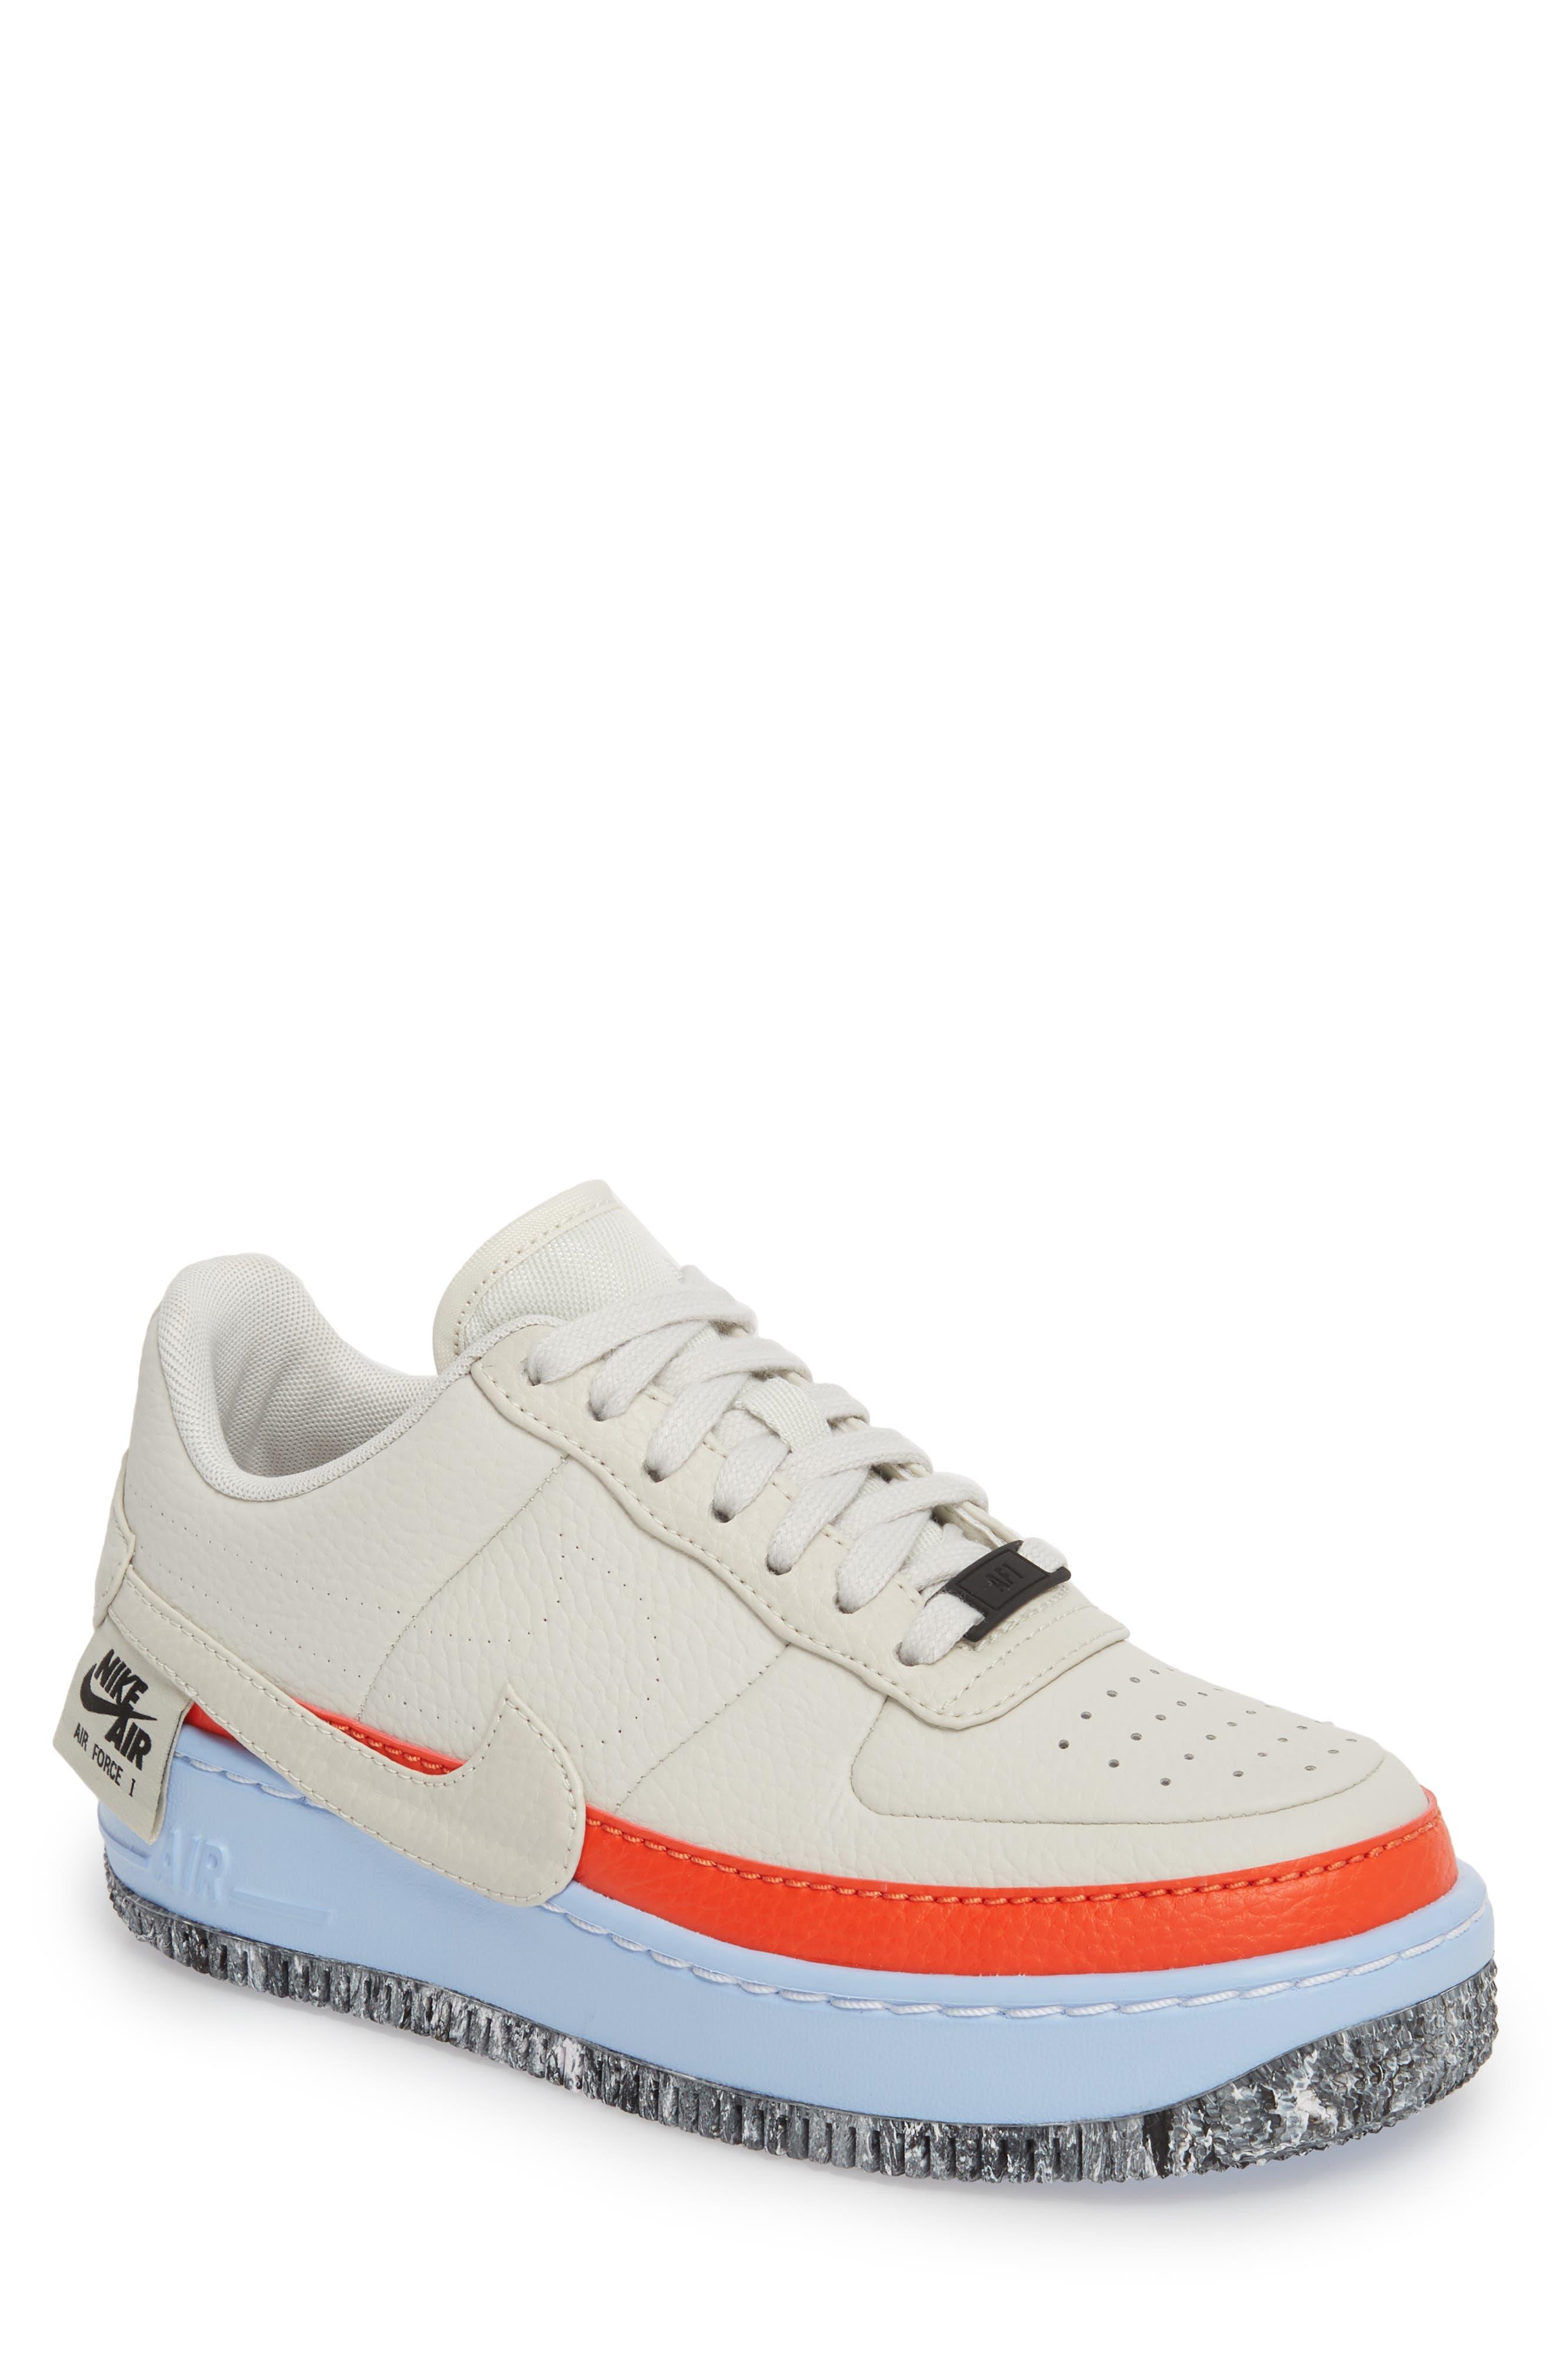 Air Force 1 Jester XX Sneaker,                             Main thumbnail 1, color,                             LIGHT BONE/ TEAM ORANGE